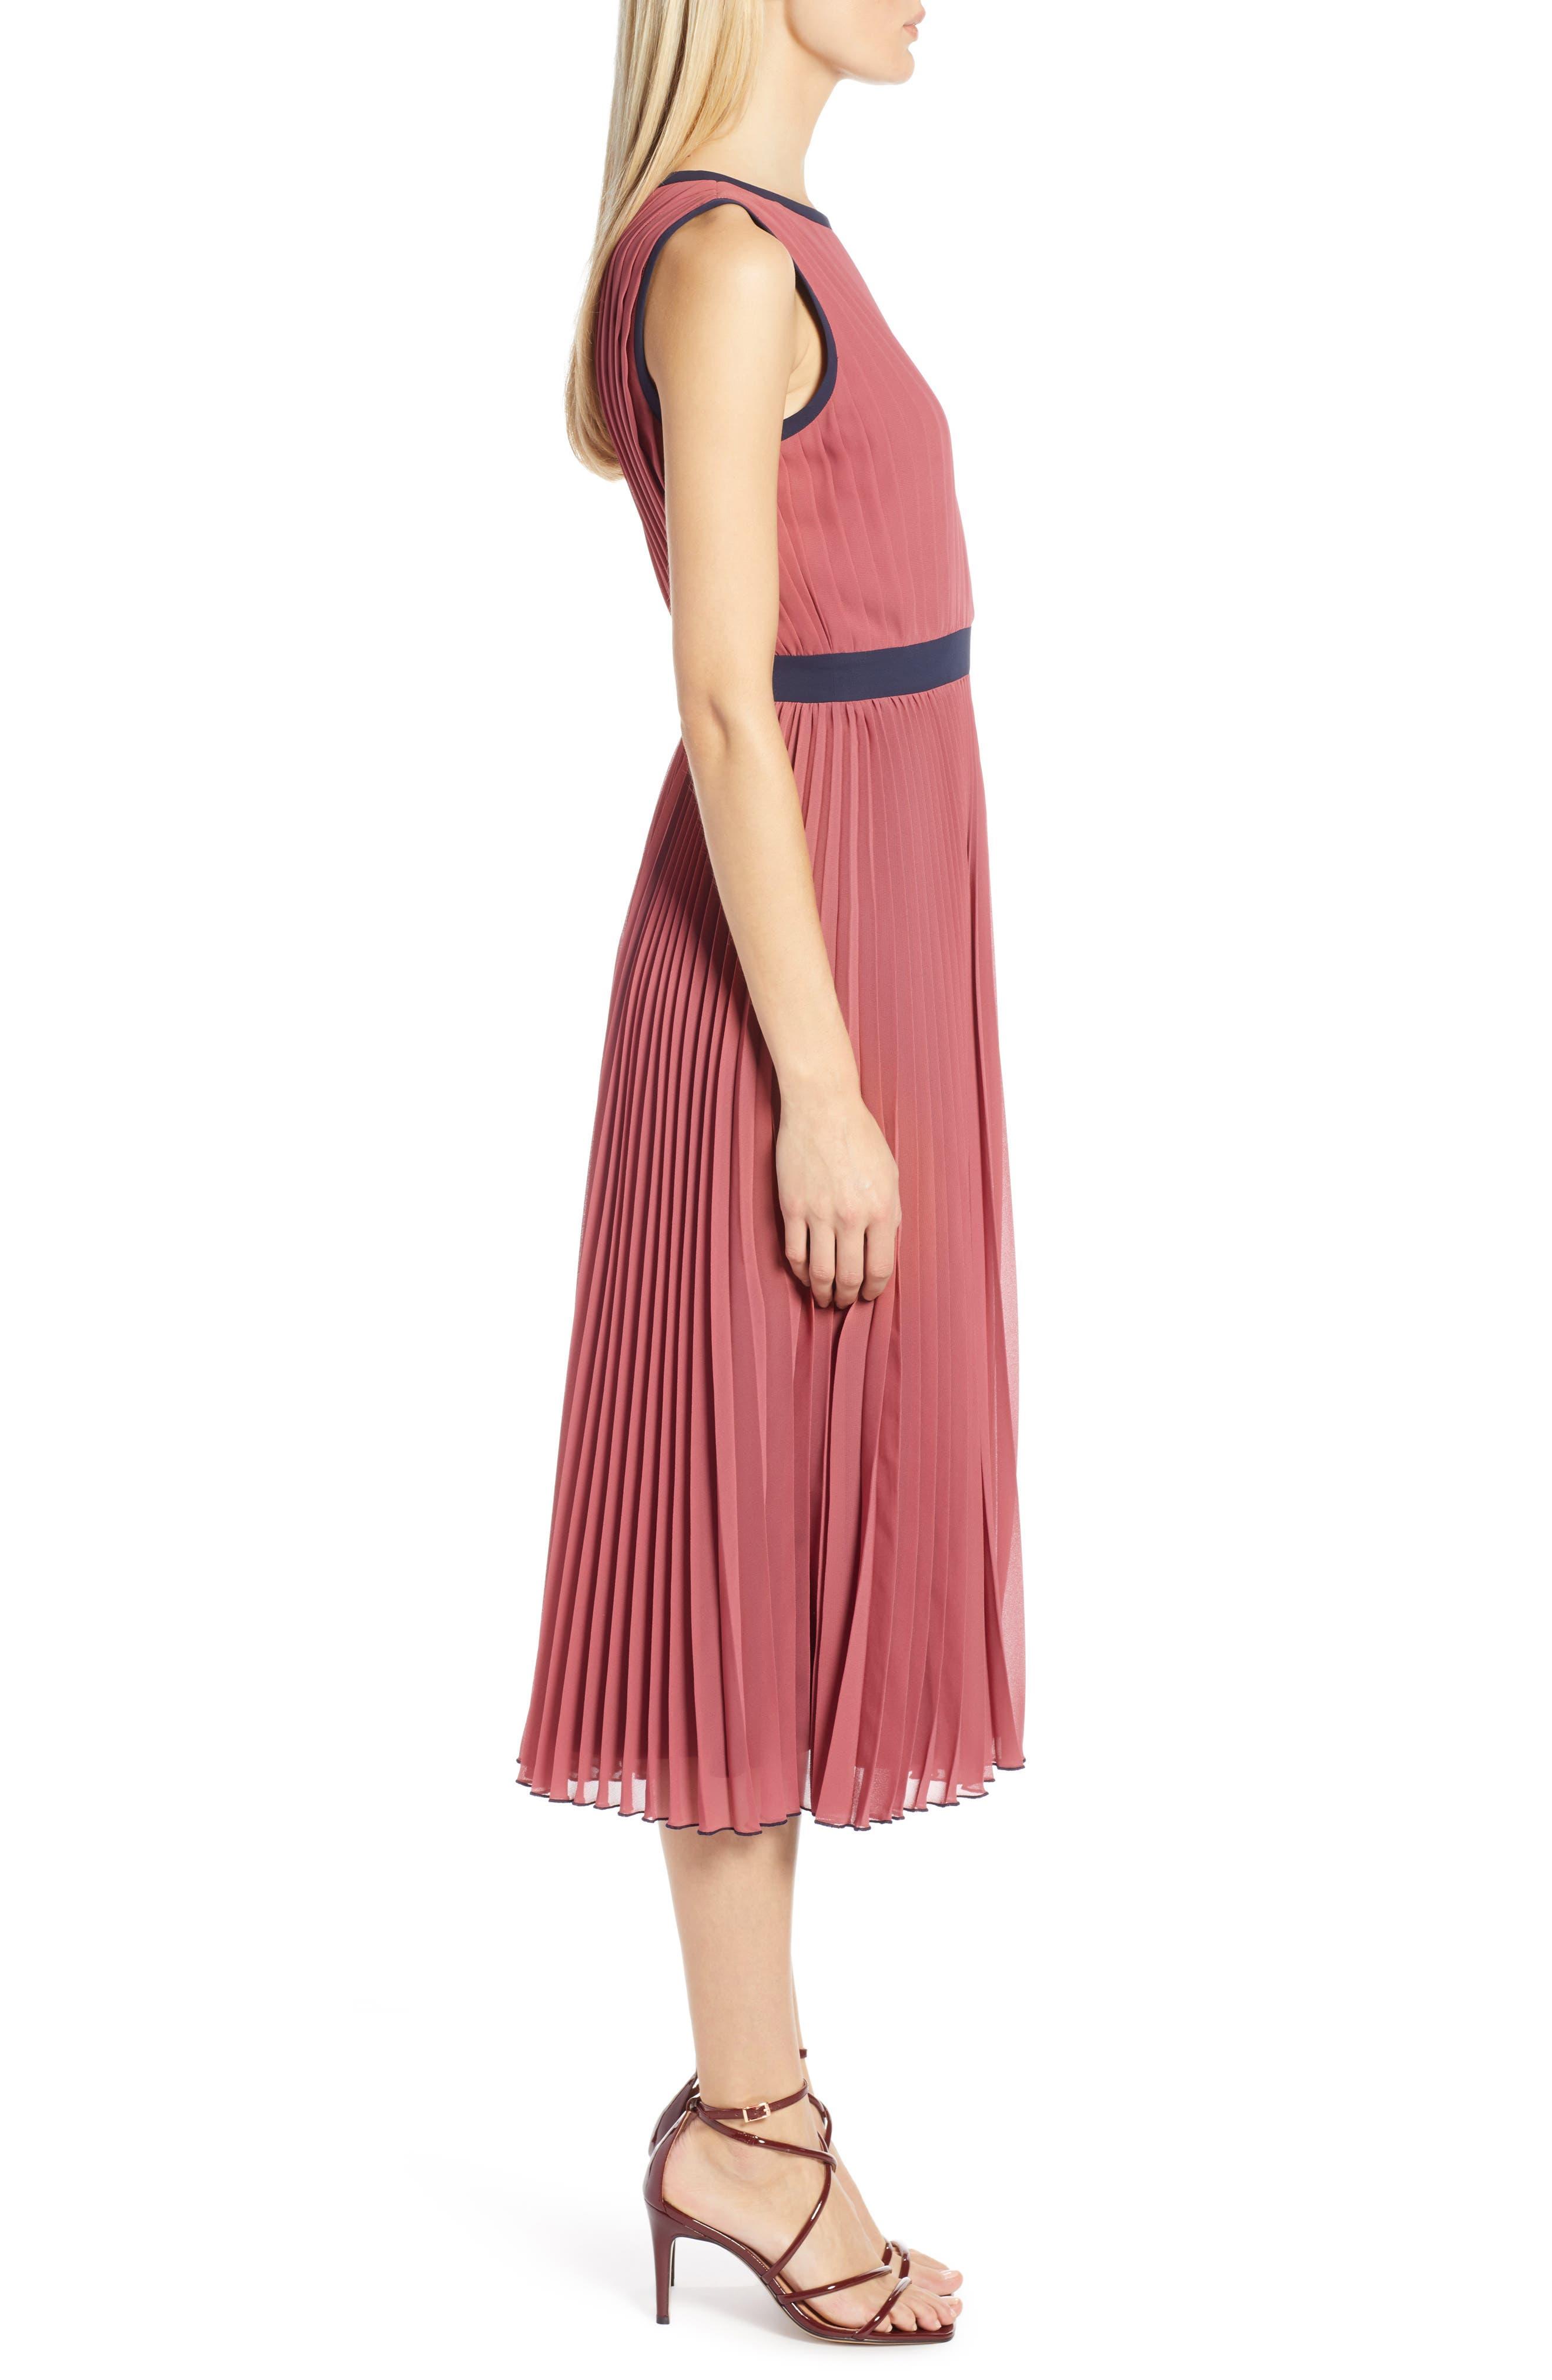 x Atlantic-Pacific Colorblock Pleated Midi Dress,                             Alternate thumbnail 3, color,                             PINK- NAVY COLORBLOCK